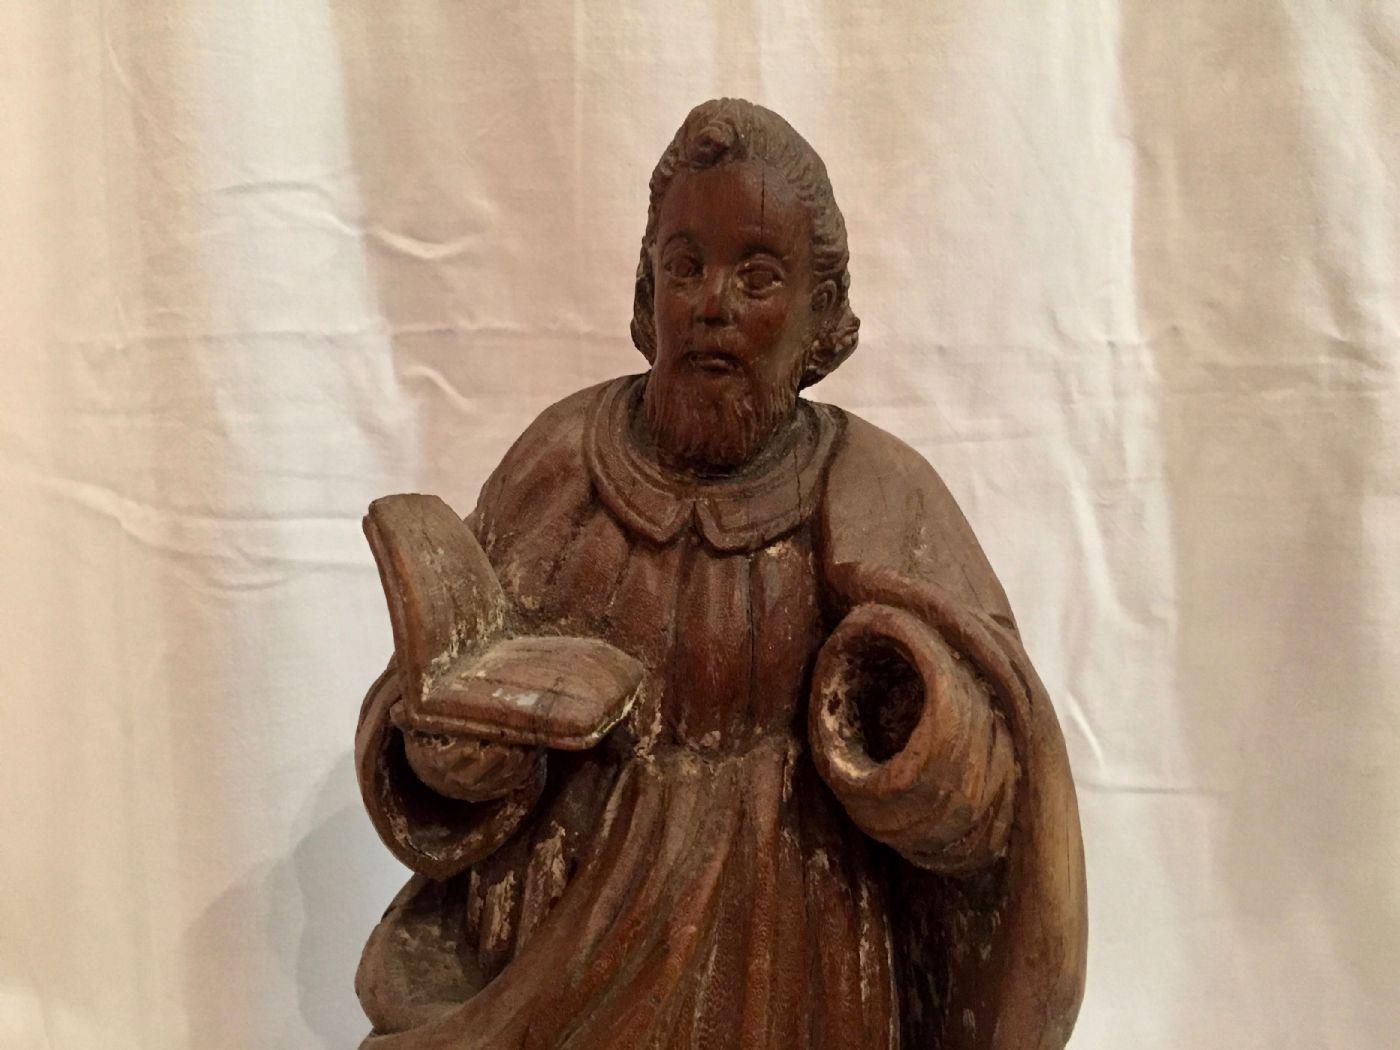 thumb3|Evangelista San Marco, legno, XIX° secolo